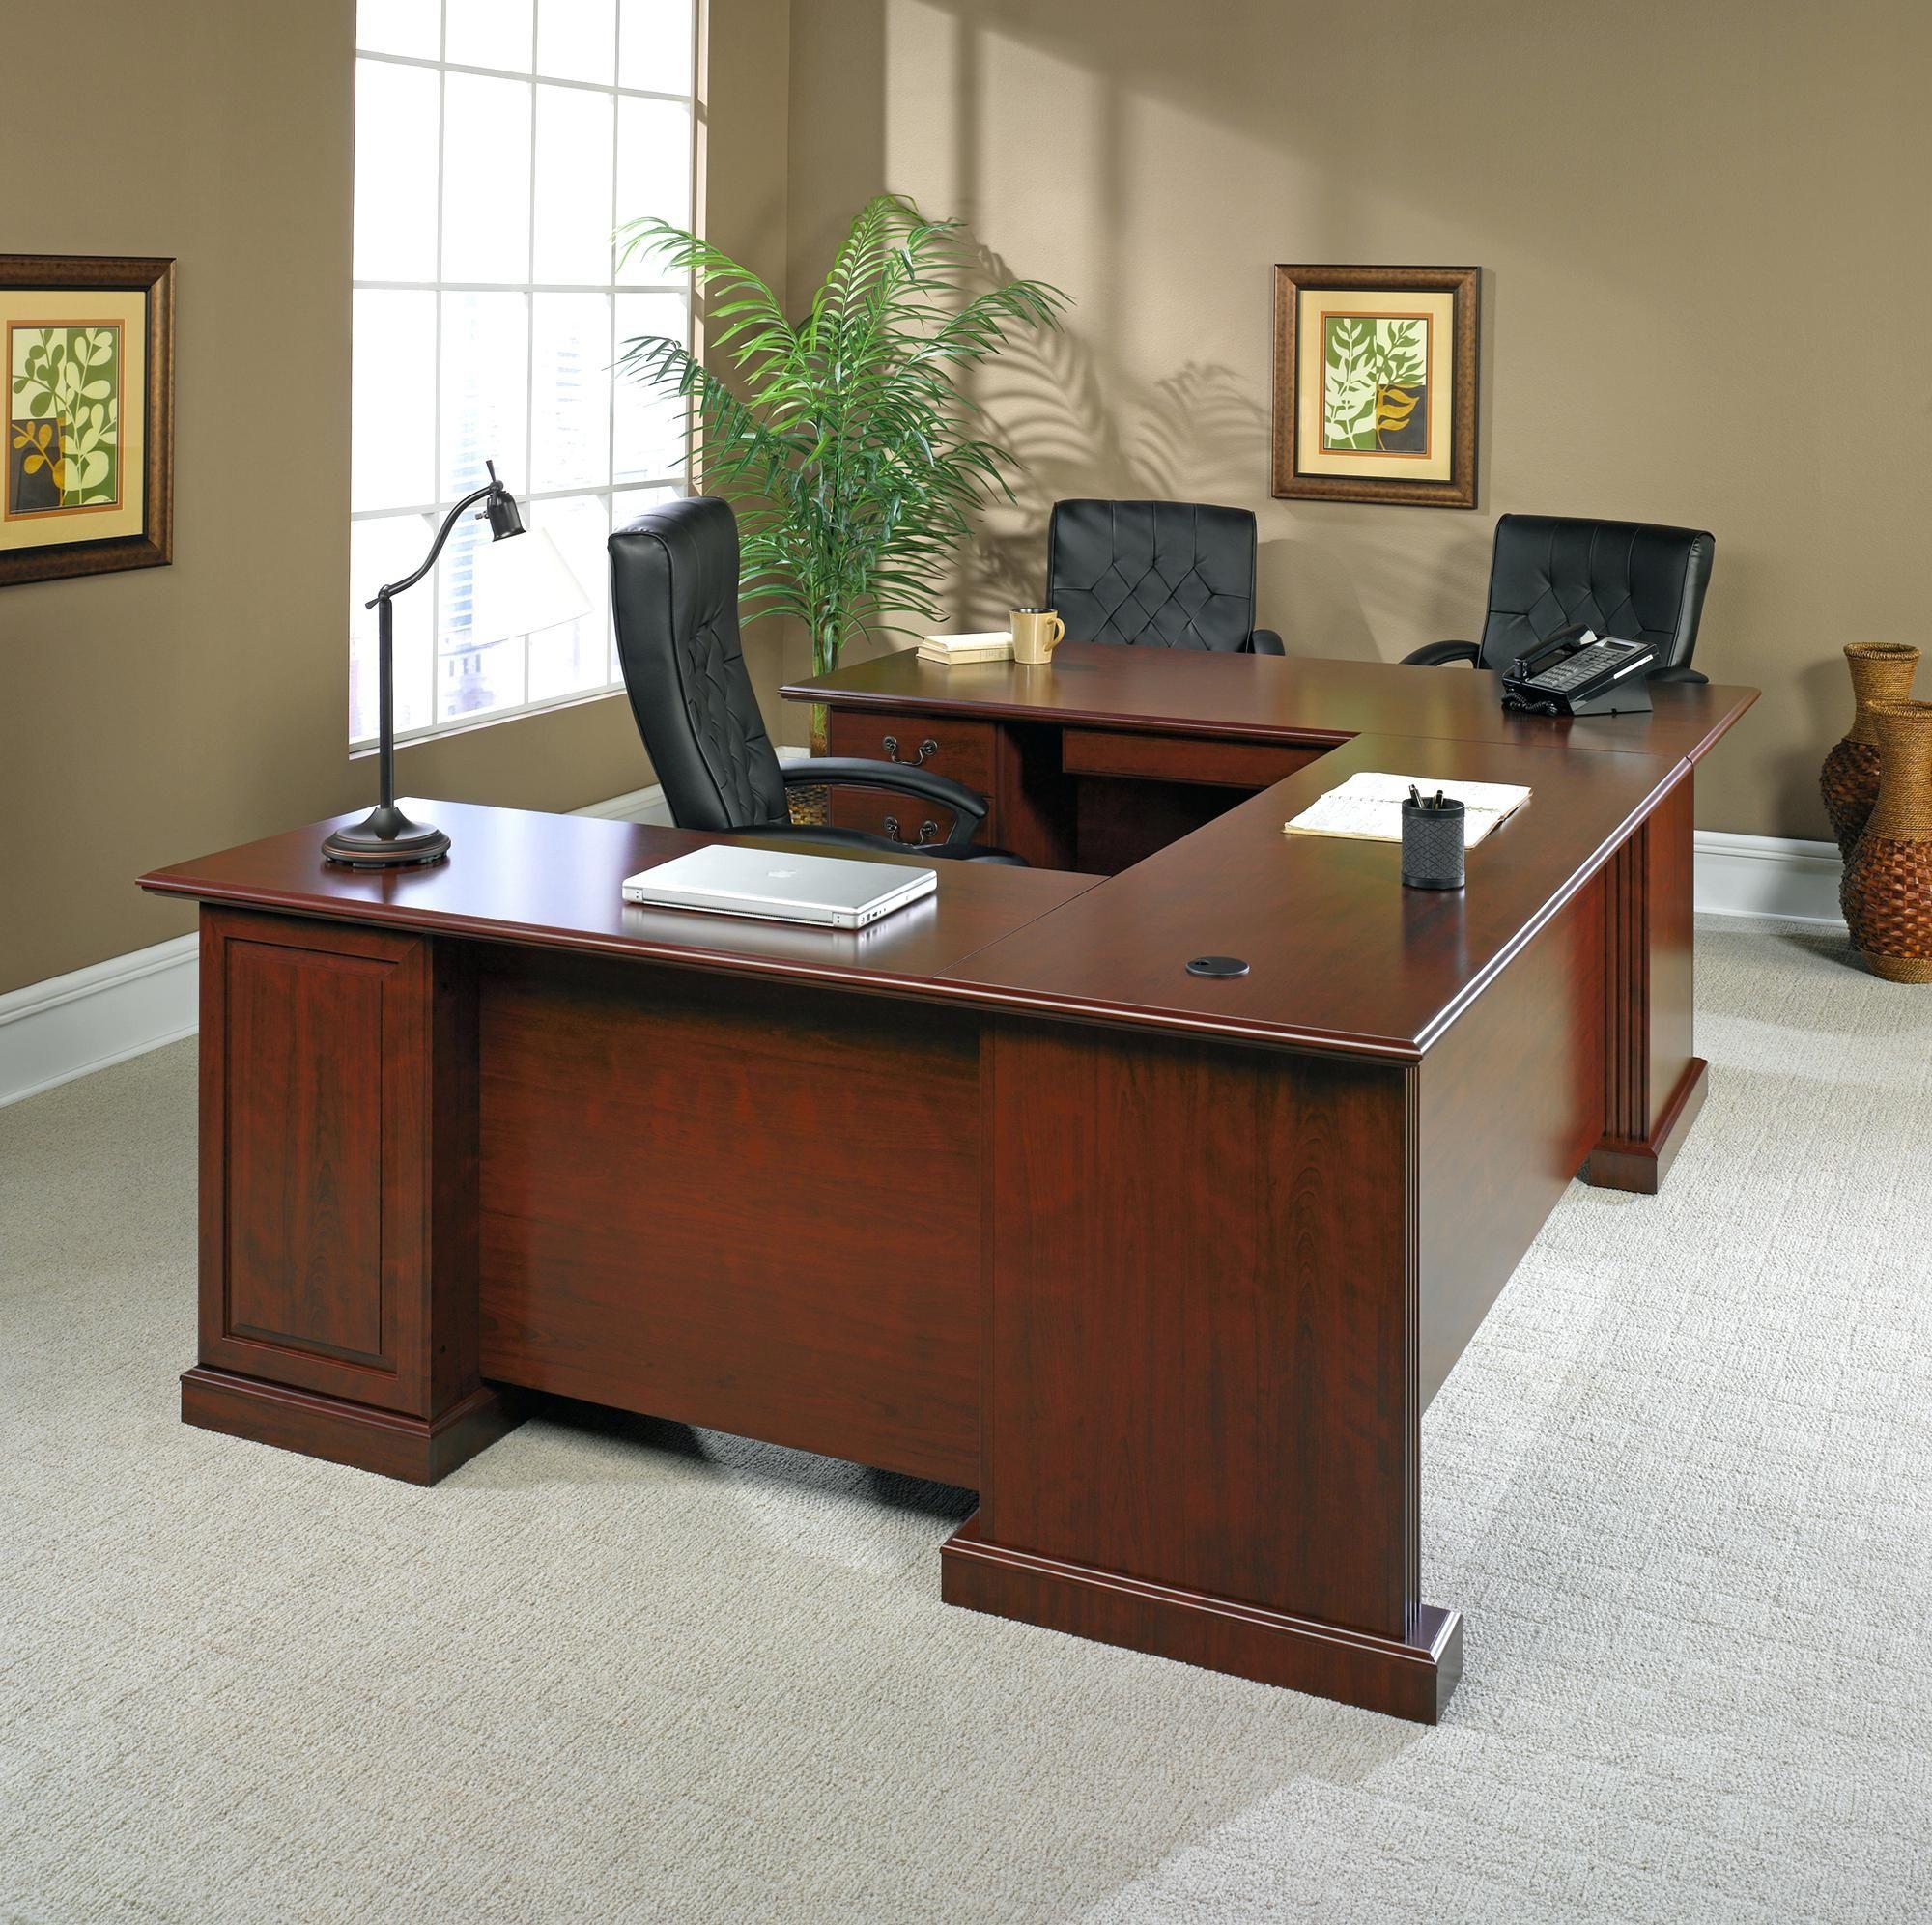 Executive Desks Office Depot Home Office Design Home Office